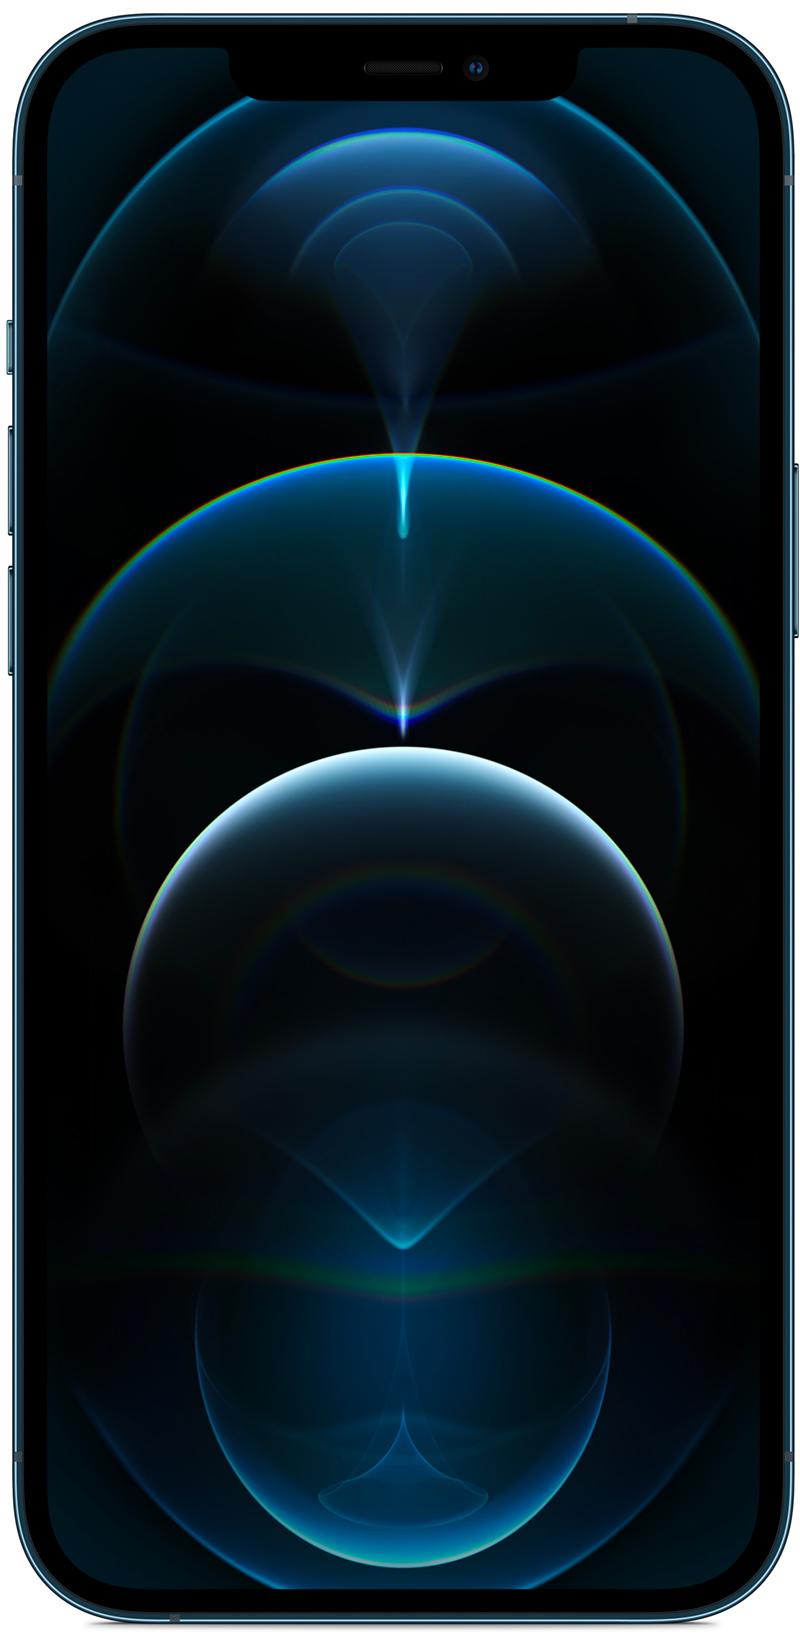 Apple iPhone 12 Pro Max bleu Pacifique 128Go